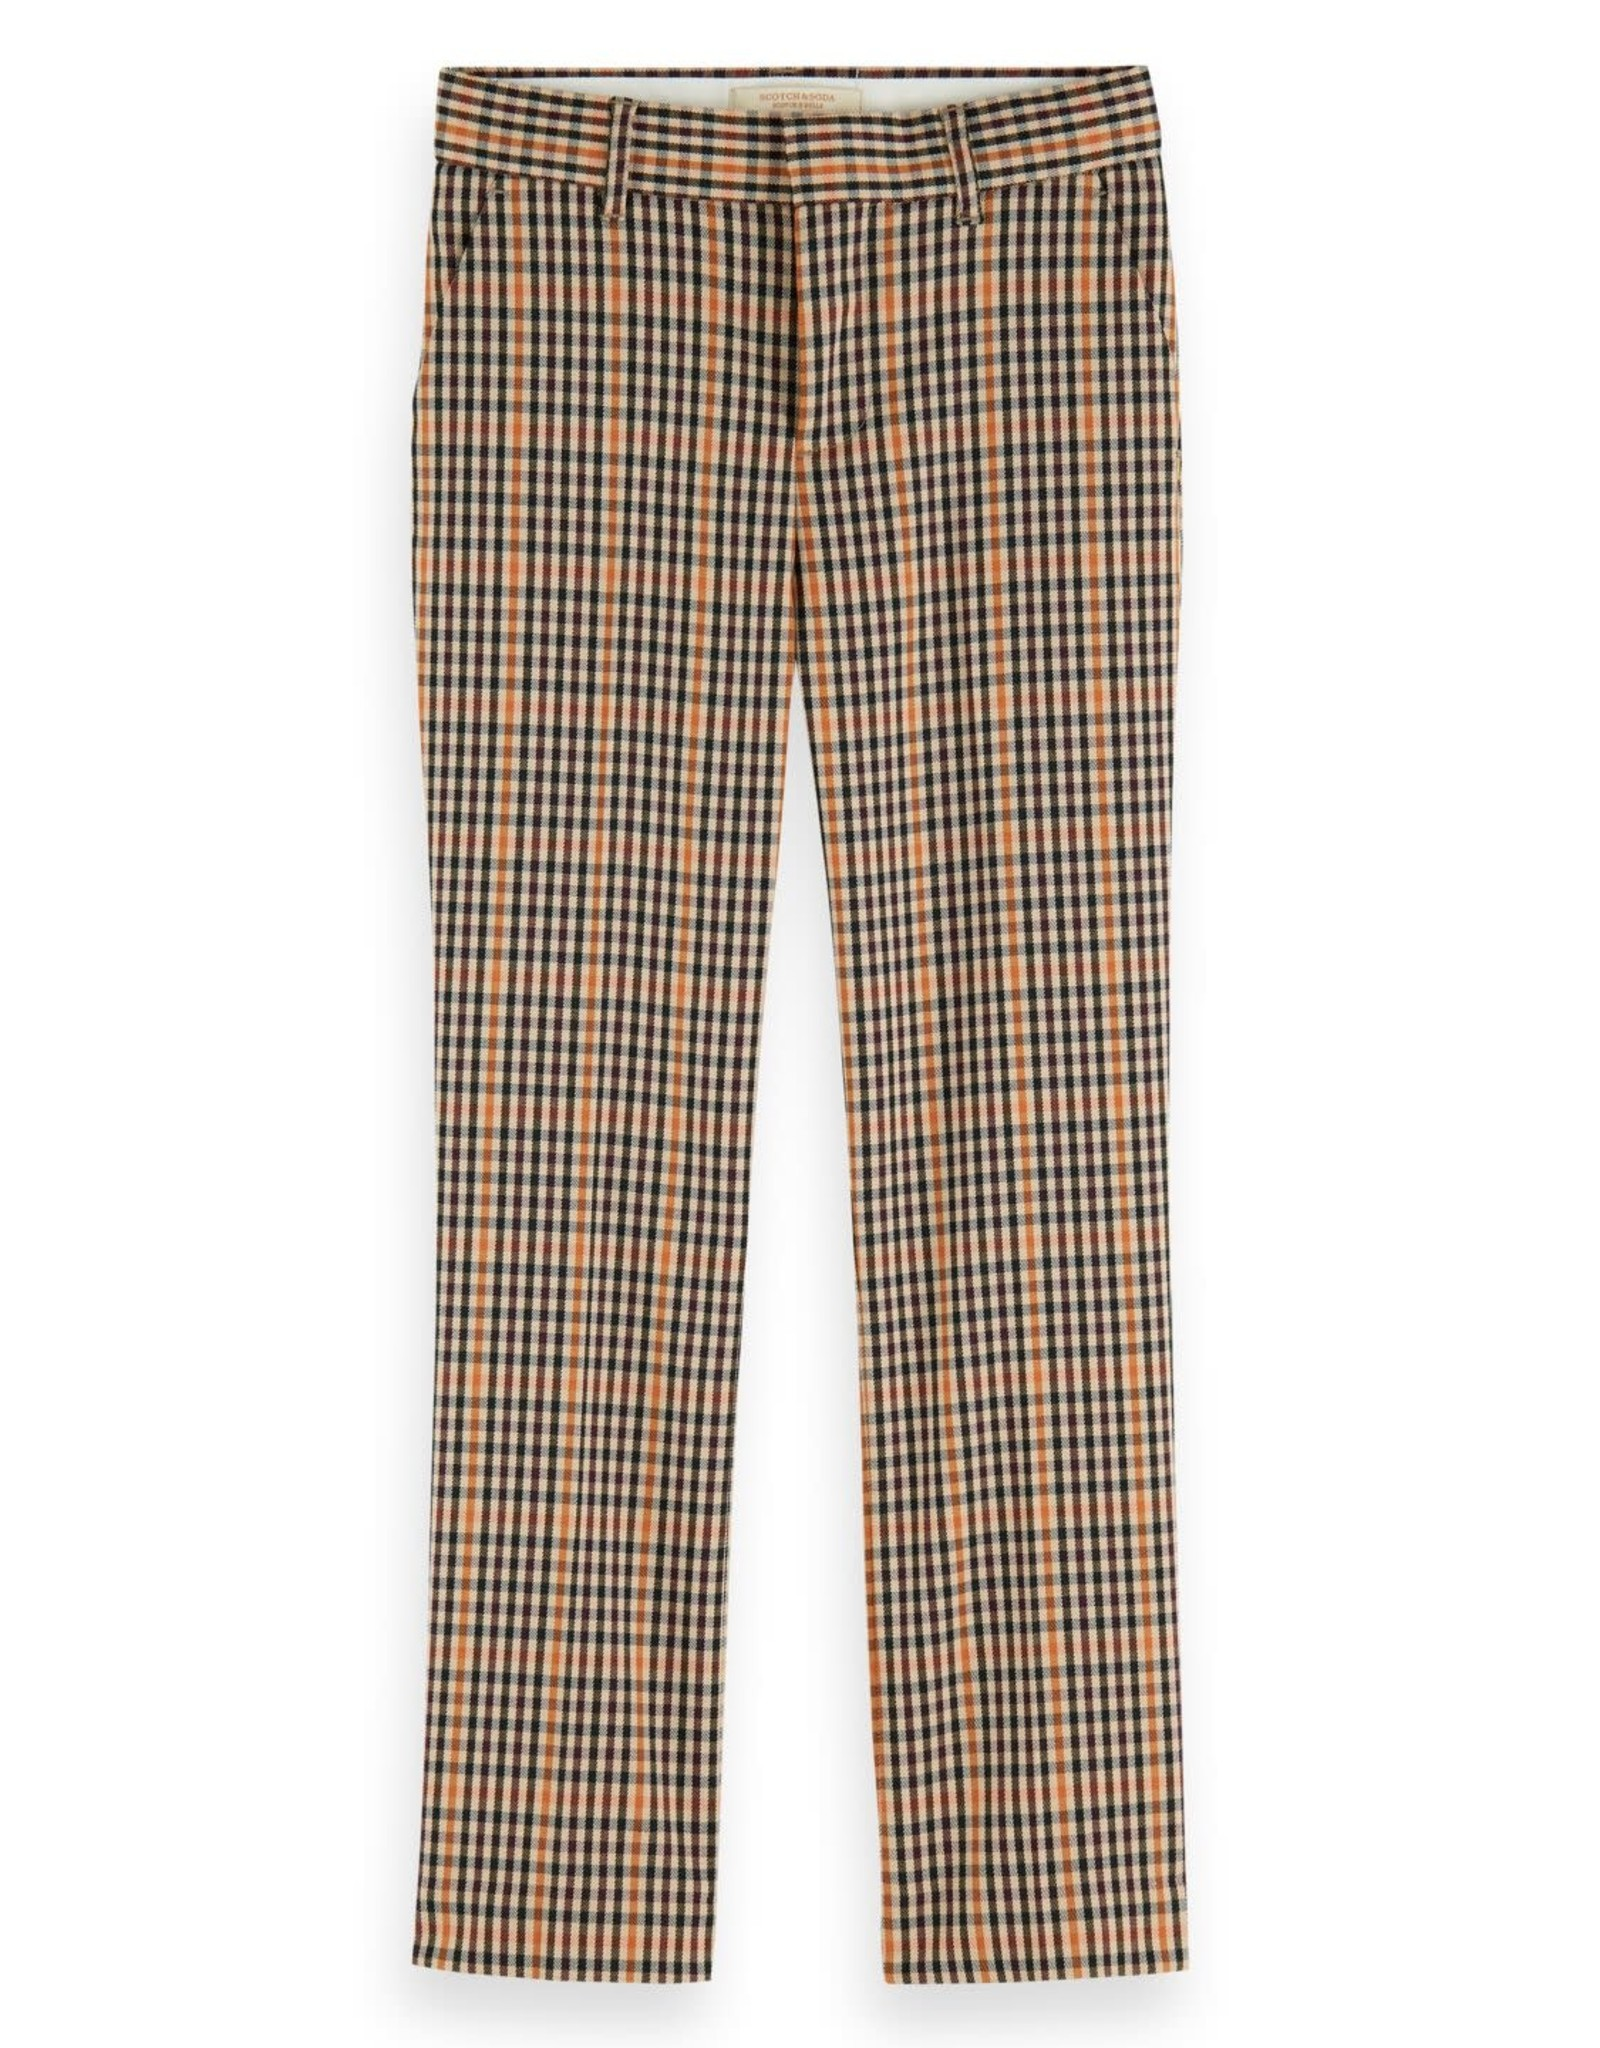 SCOTCH REBELLE Slim fit pants check 0219-Combo C